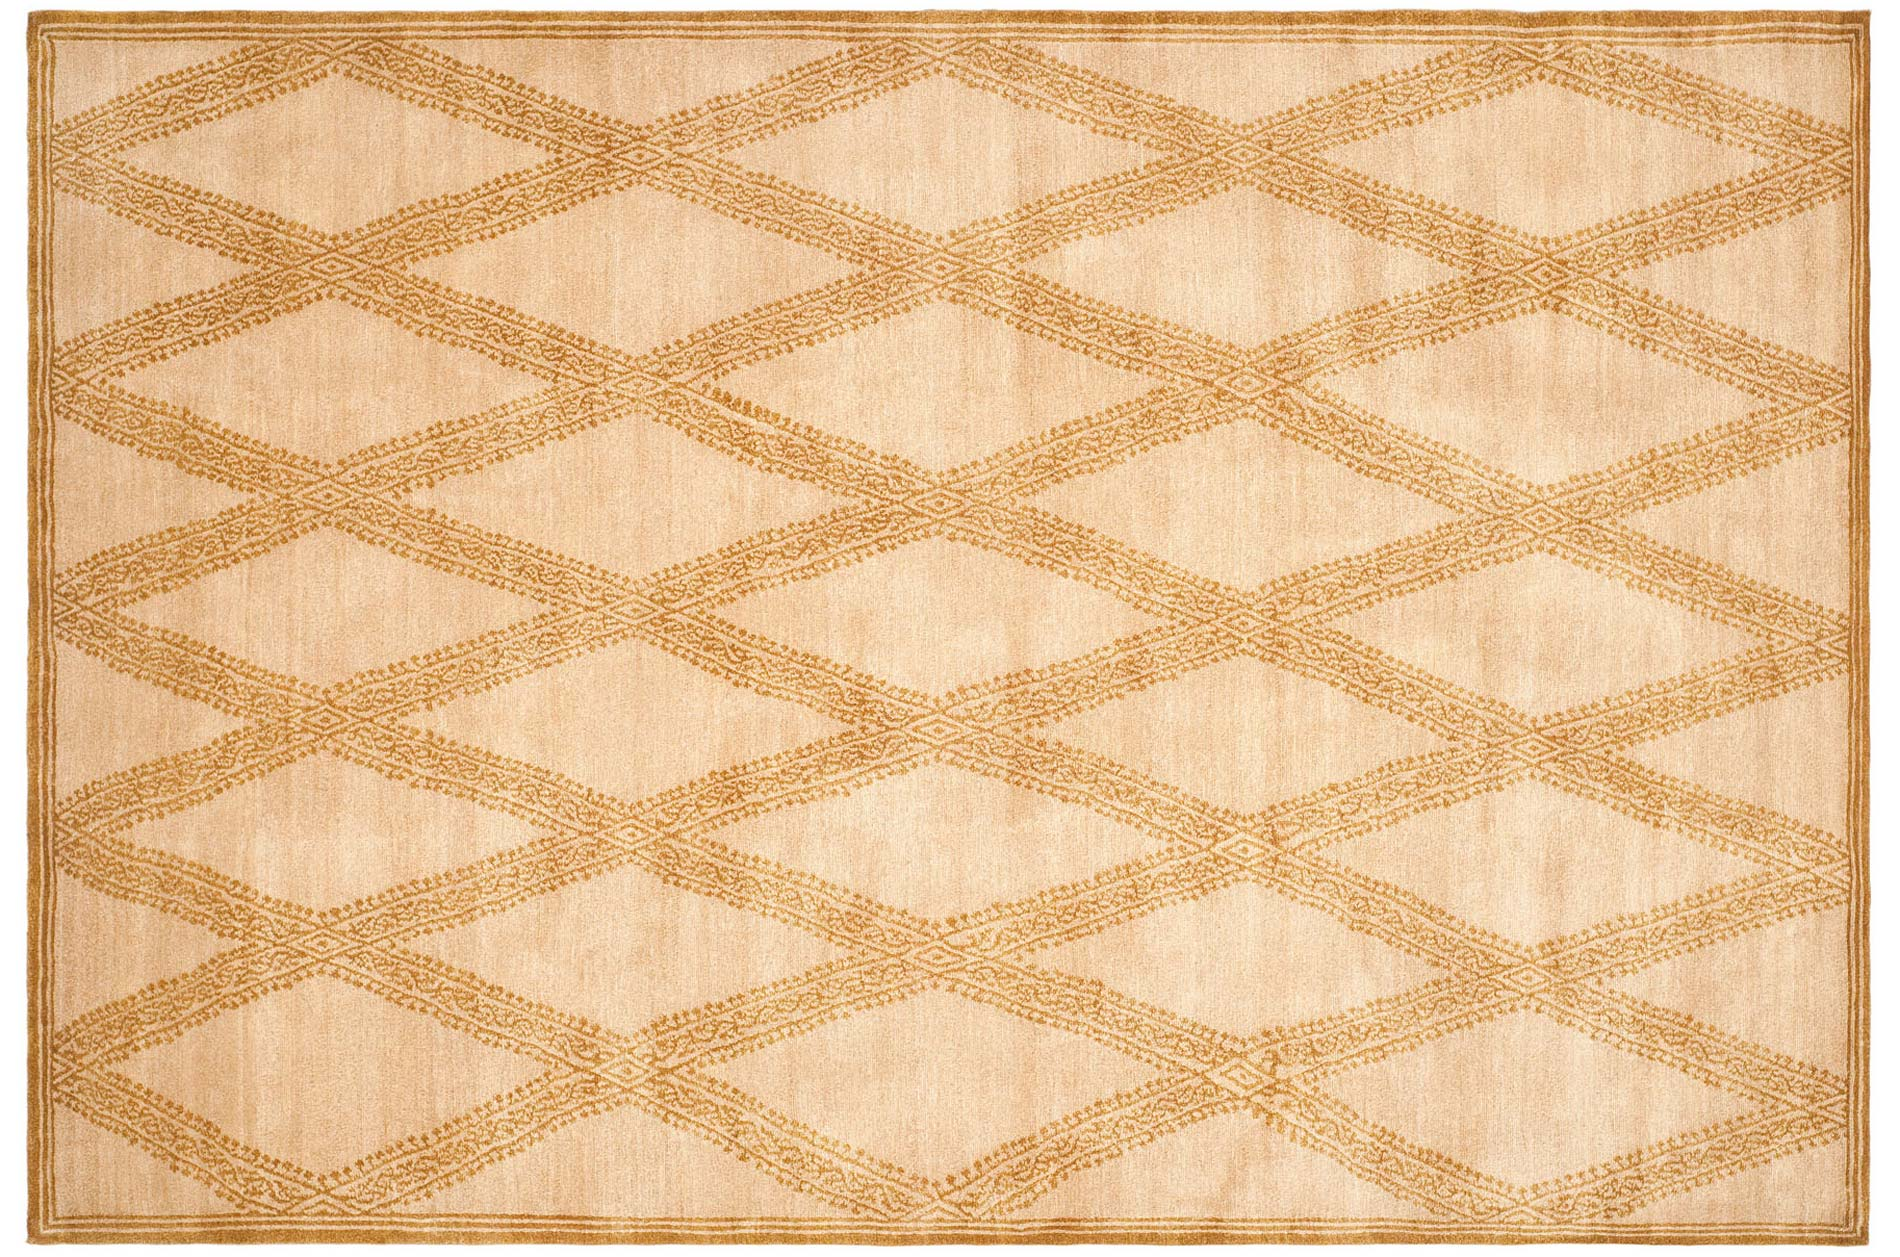 Handmade Thomas O'Brien Martine Sandstone/ Beige Wool Rug - 9' X 12' - Thumbnail 0